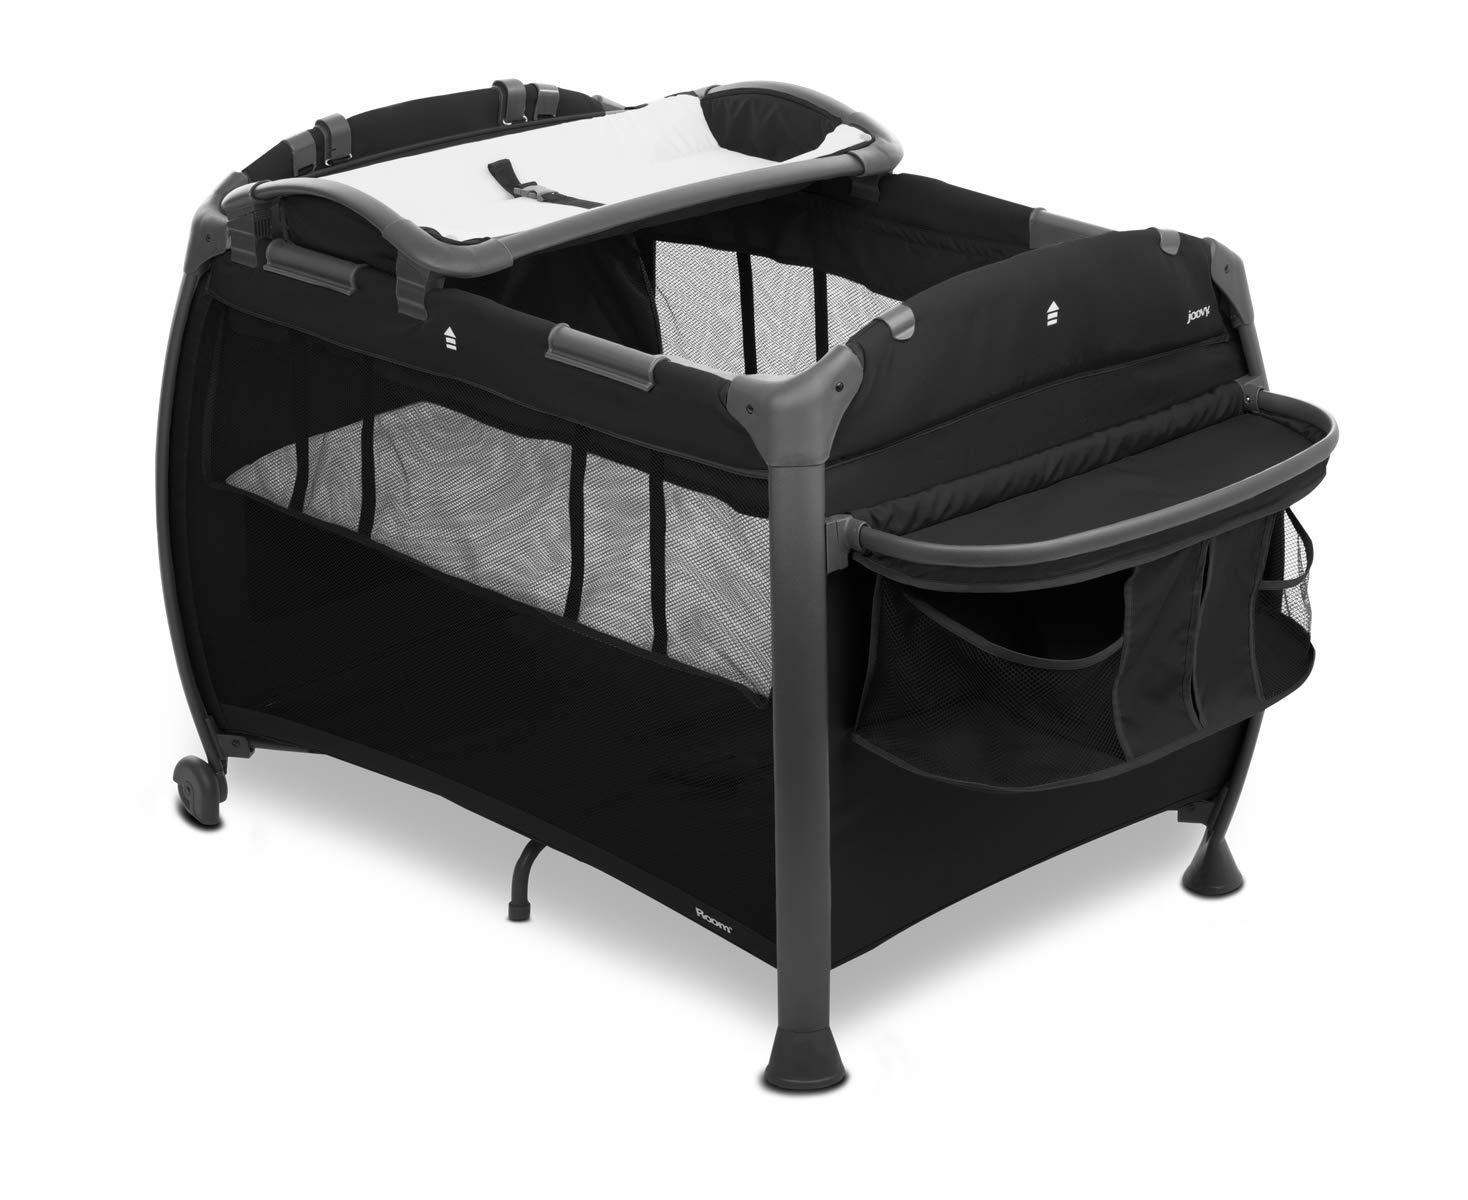 Joovy Room-Playard, Nursery Center, Bassinet, Changing-Table, Black